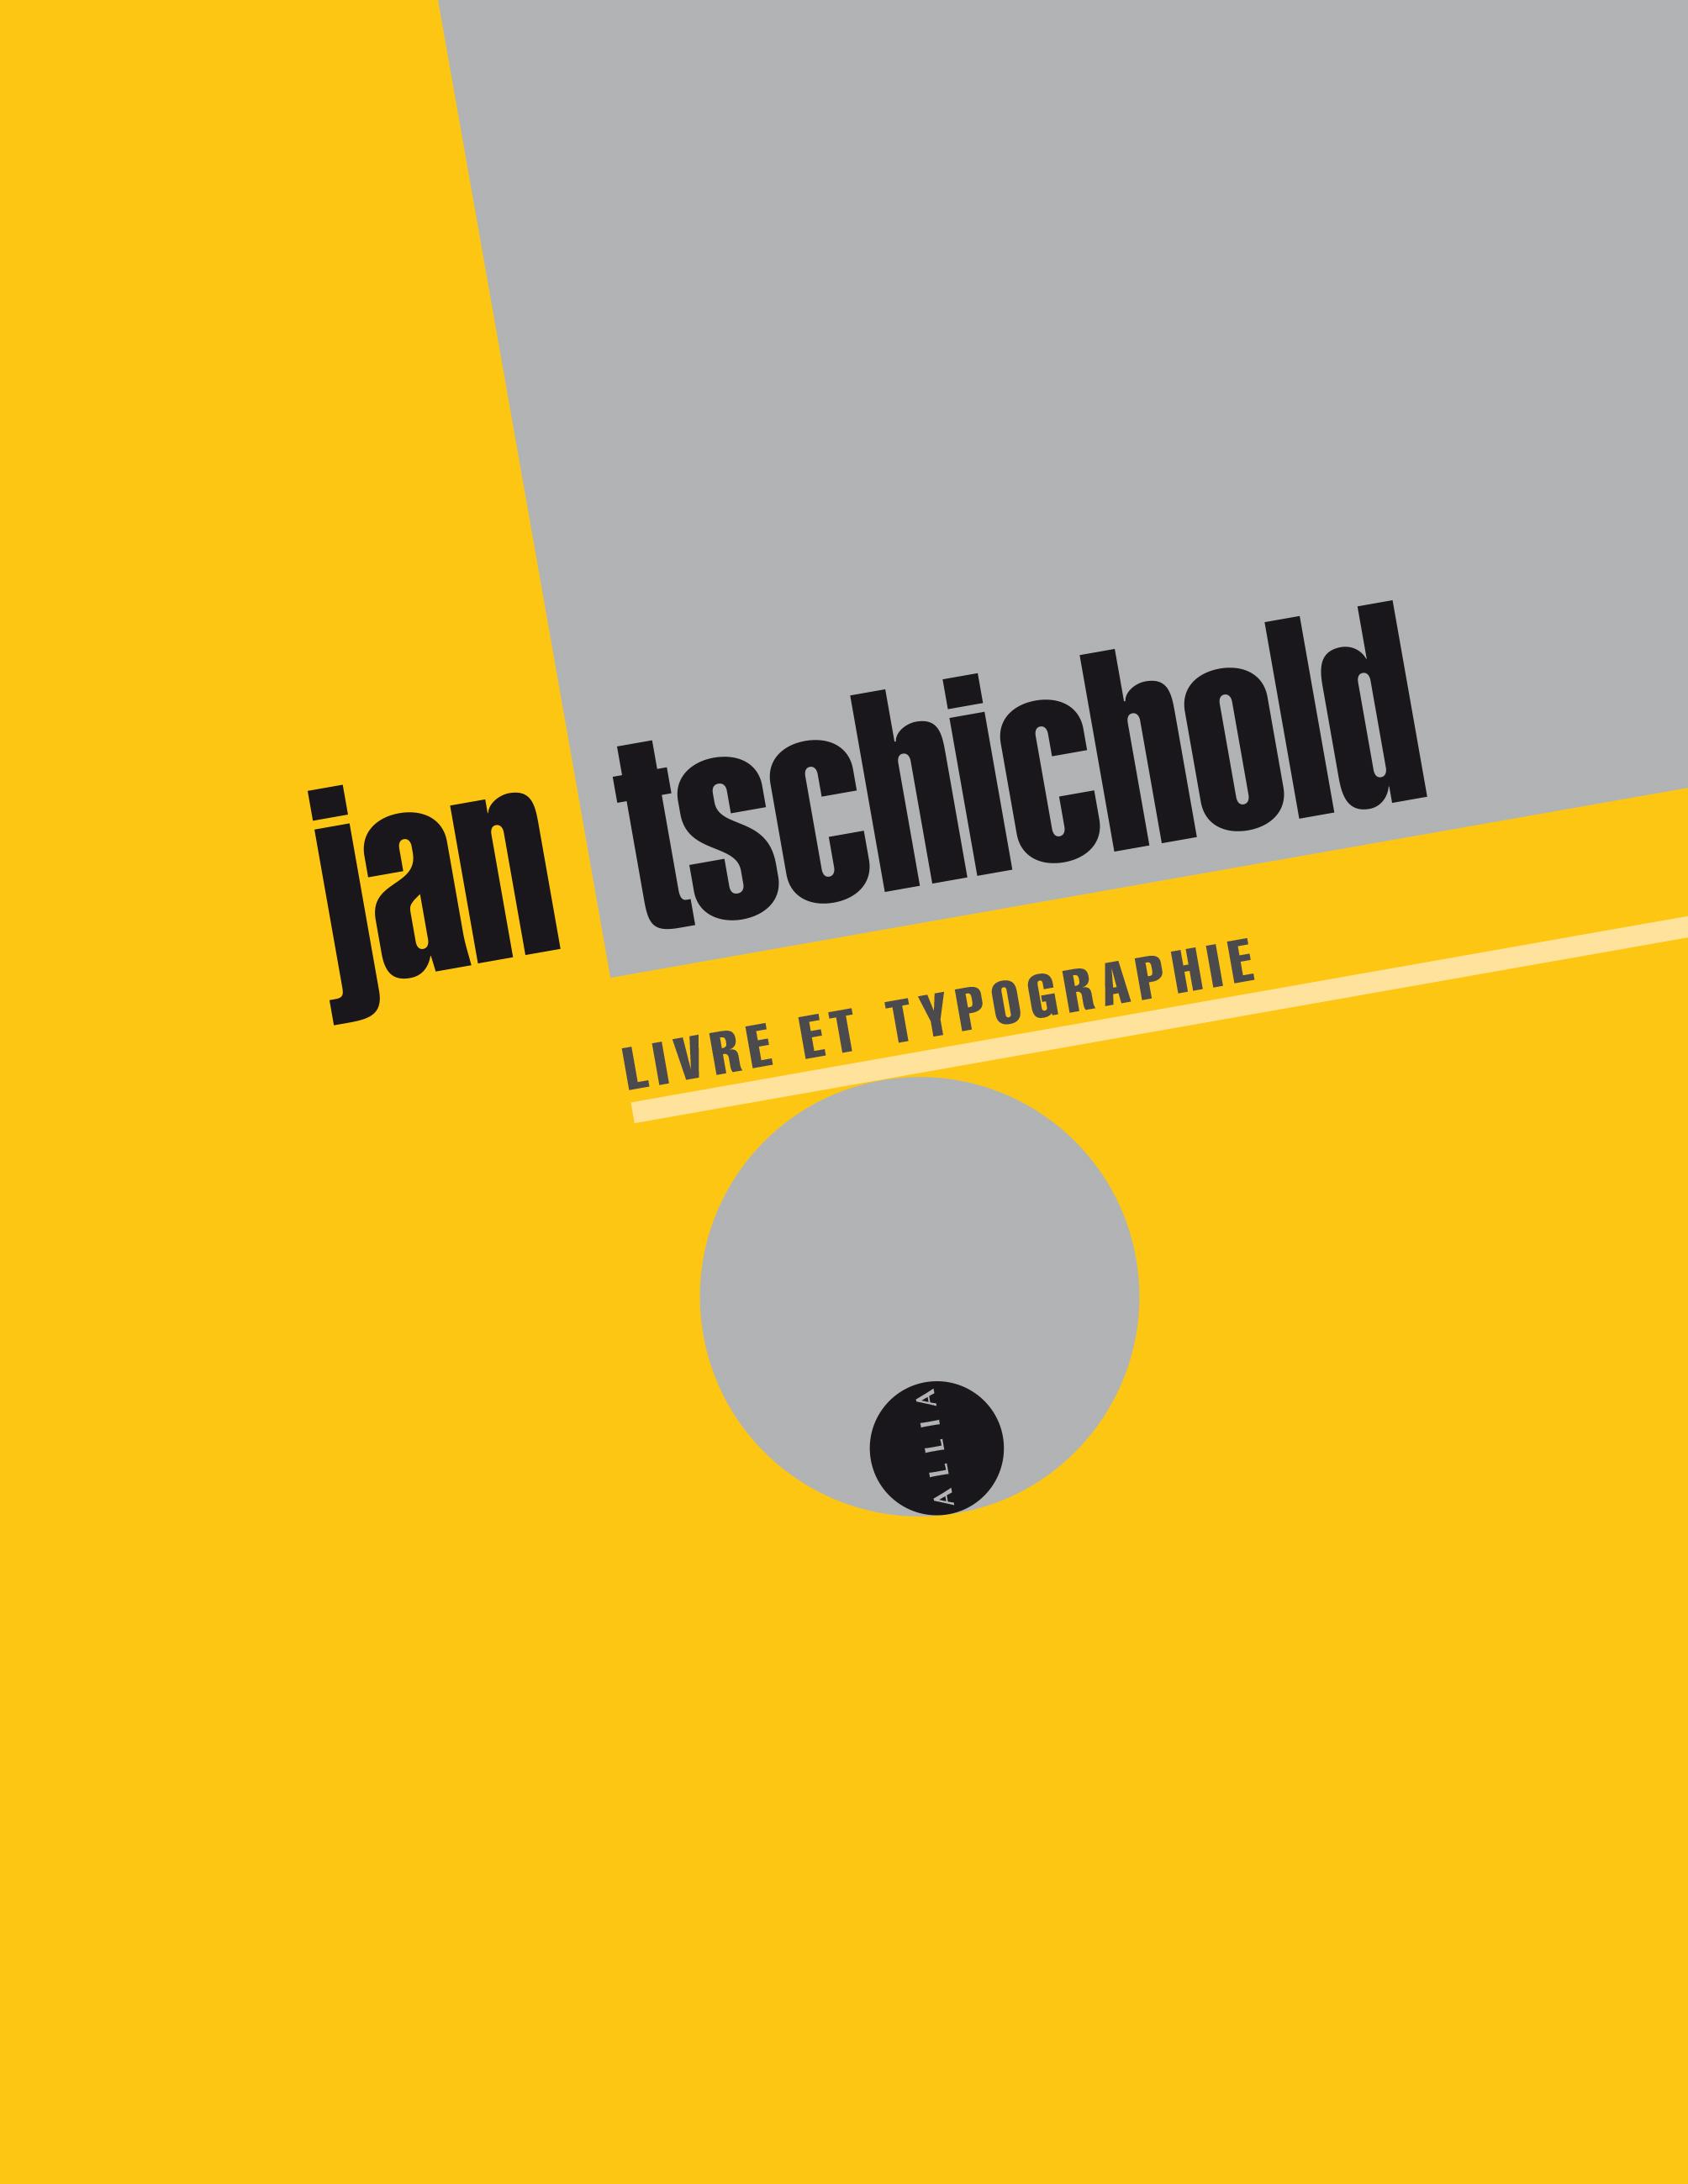 J. Tschichold, Livre et typographie